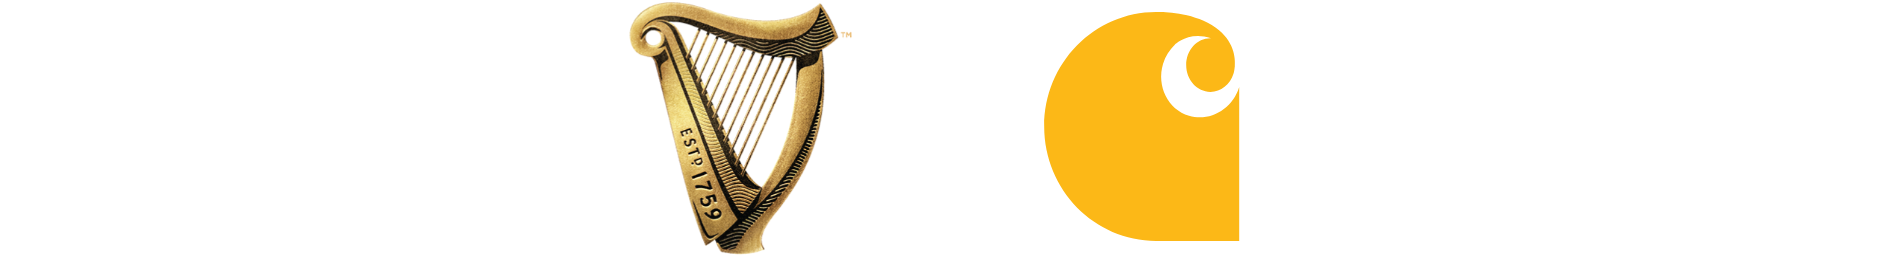 Guinness & Carhartt logo